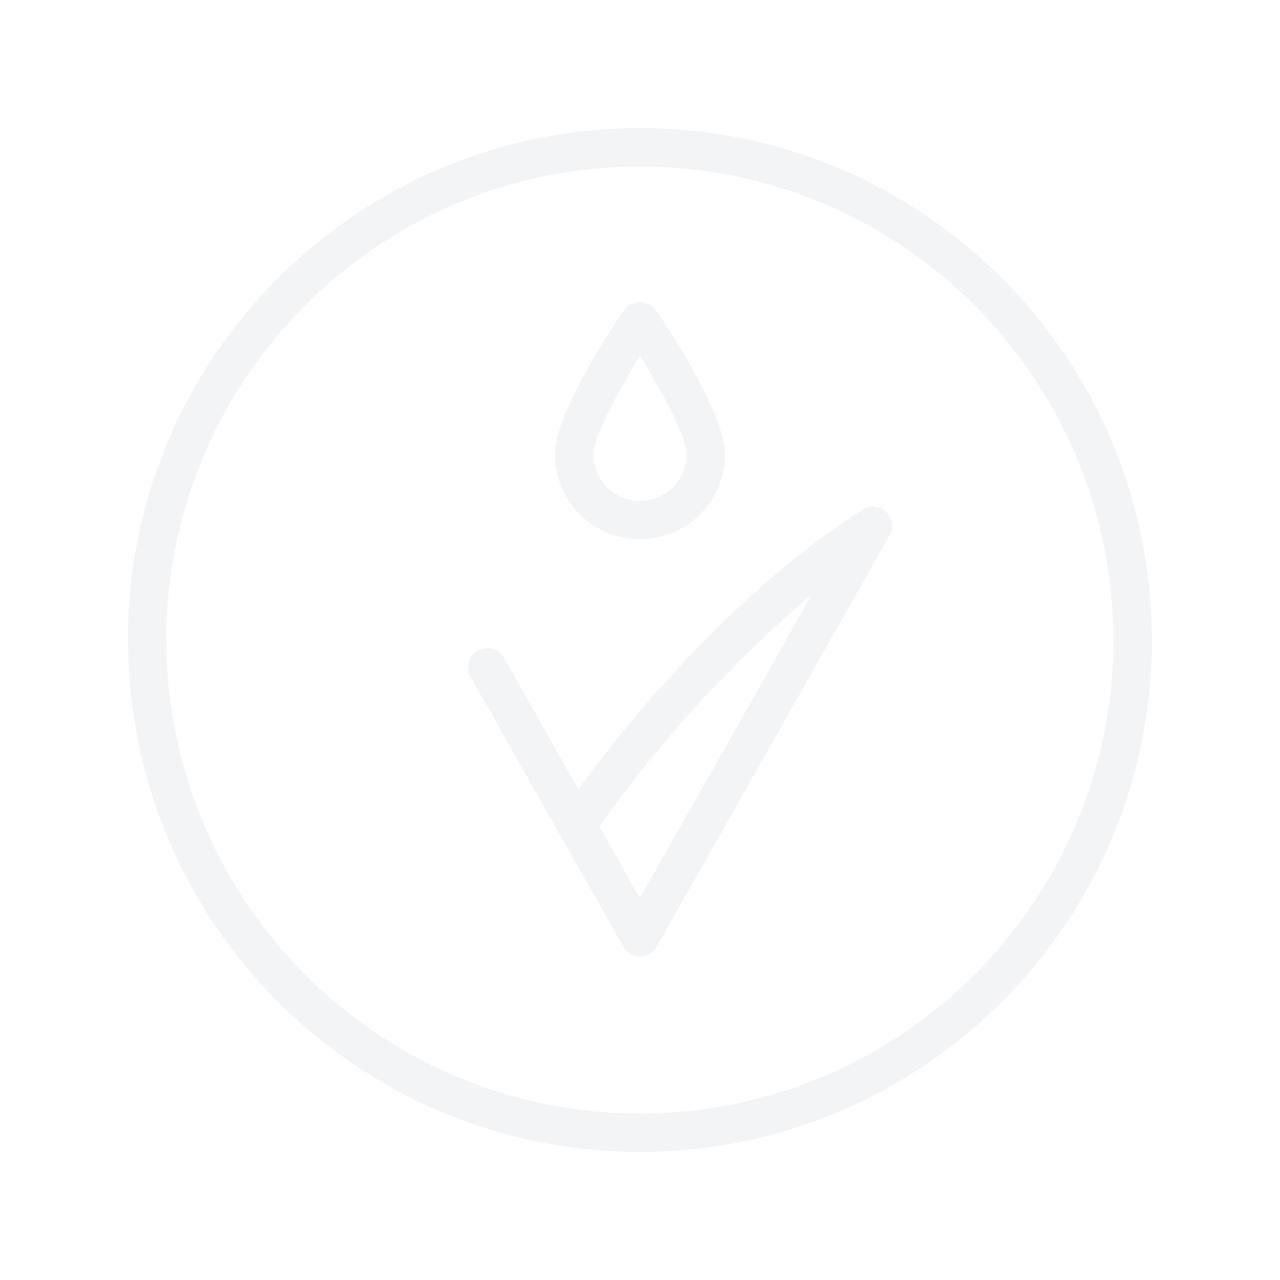 L'OREAL Color Riche Couture Lip Liner карандаш для губ 5g